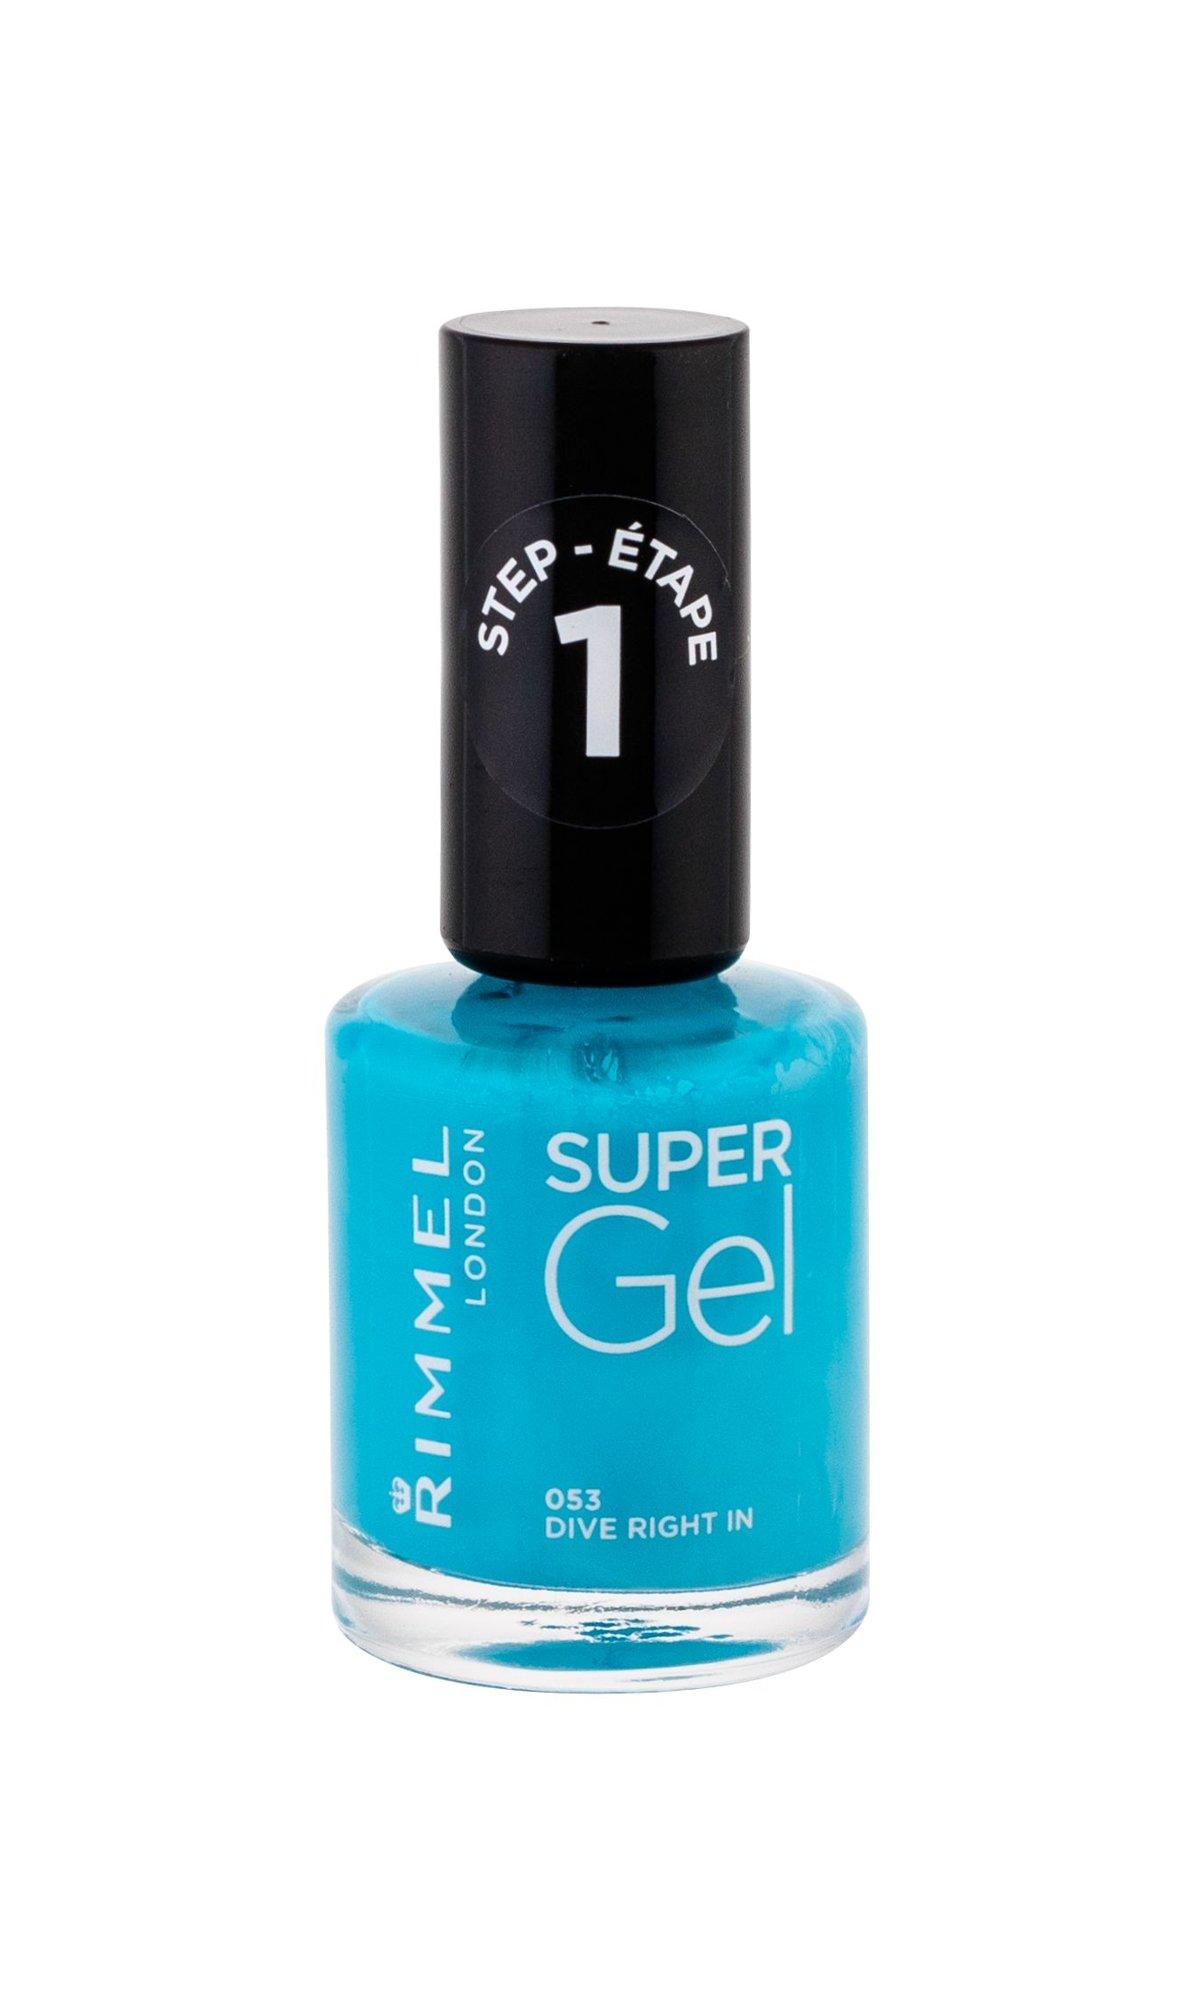 Rimmel London Super Gel Nail Polish 12ml 053 Dive Right In